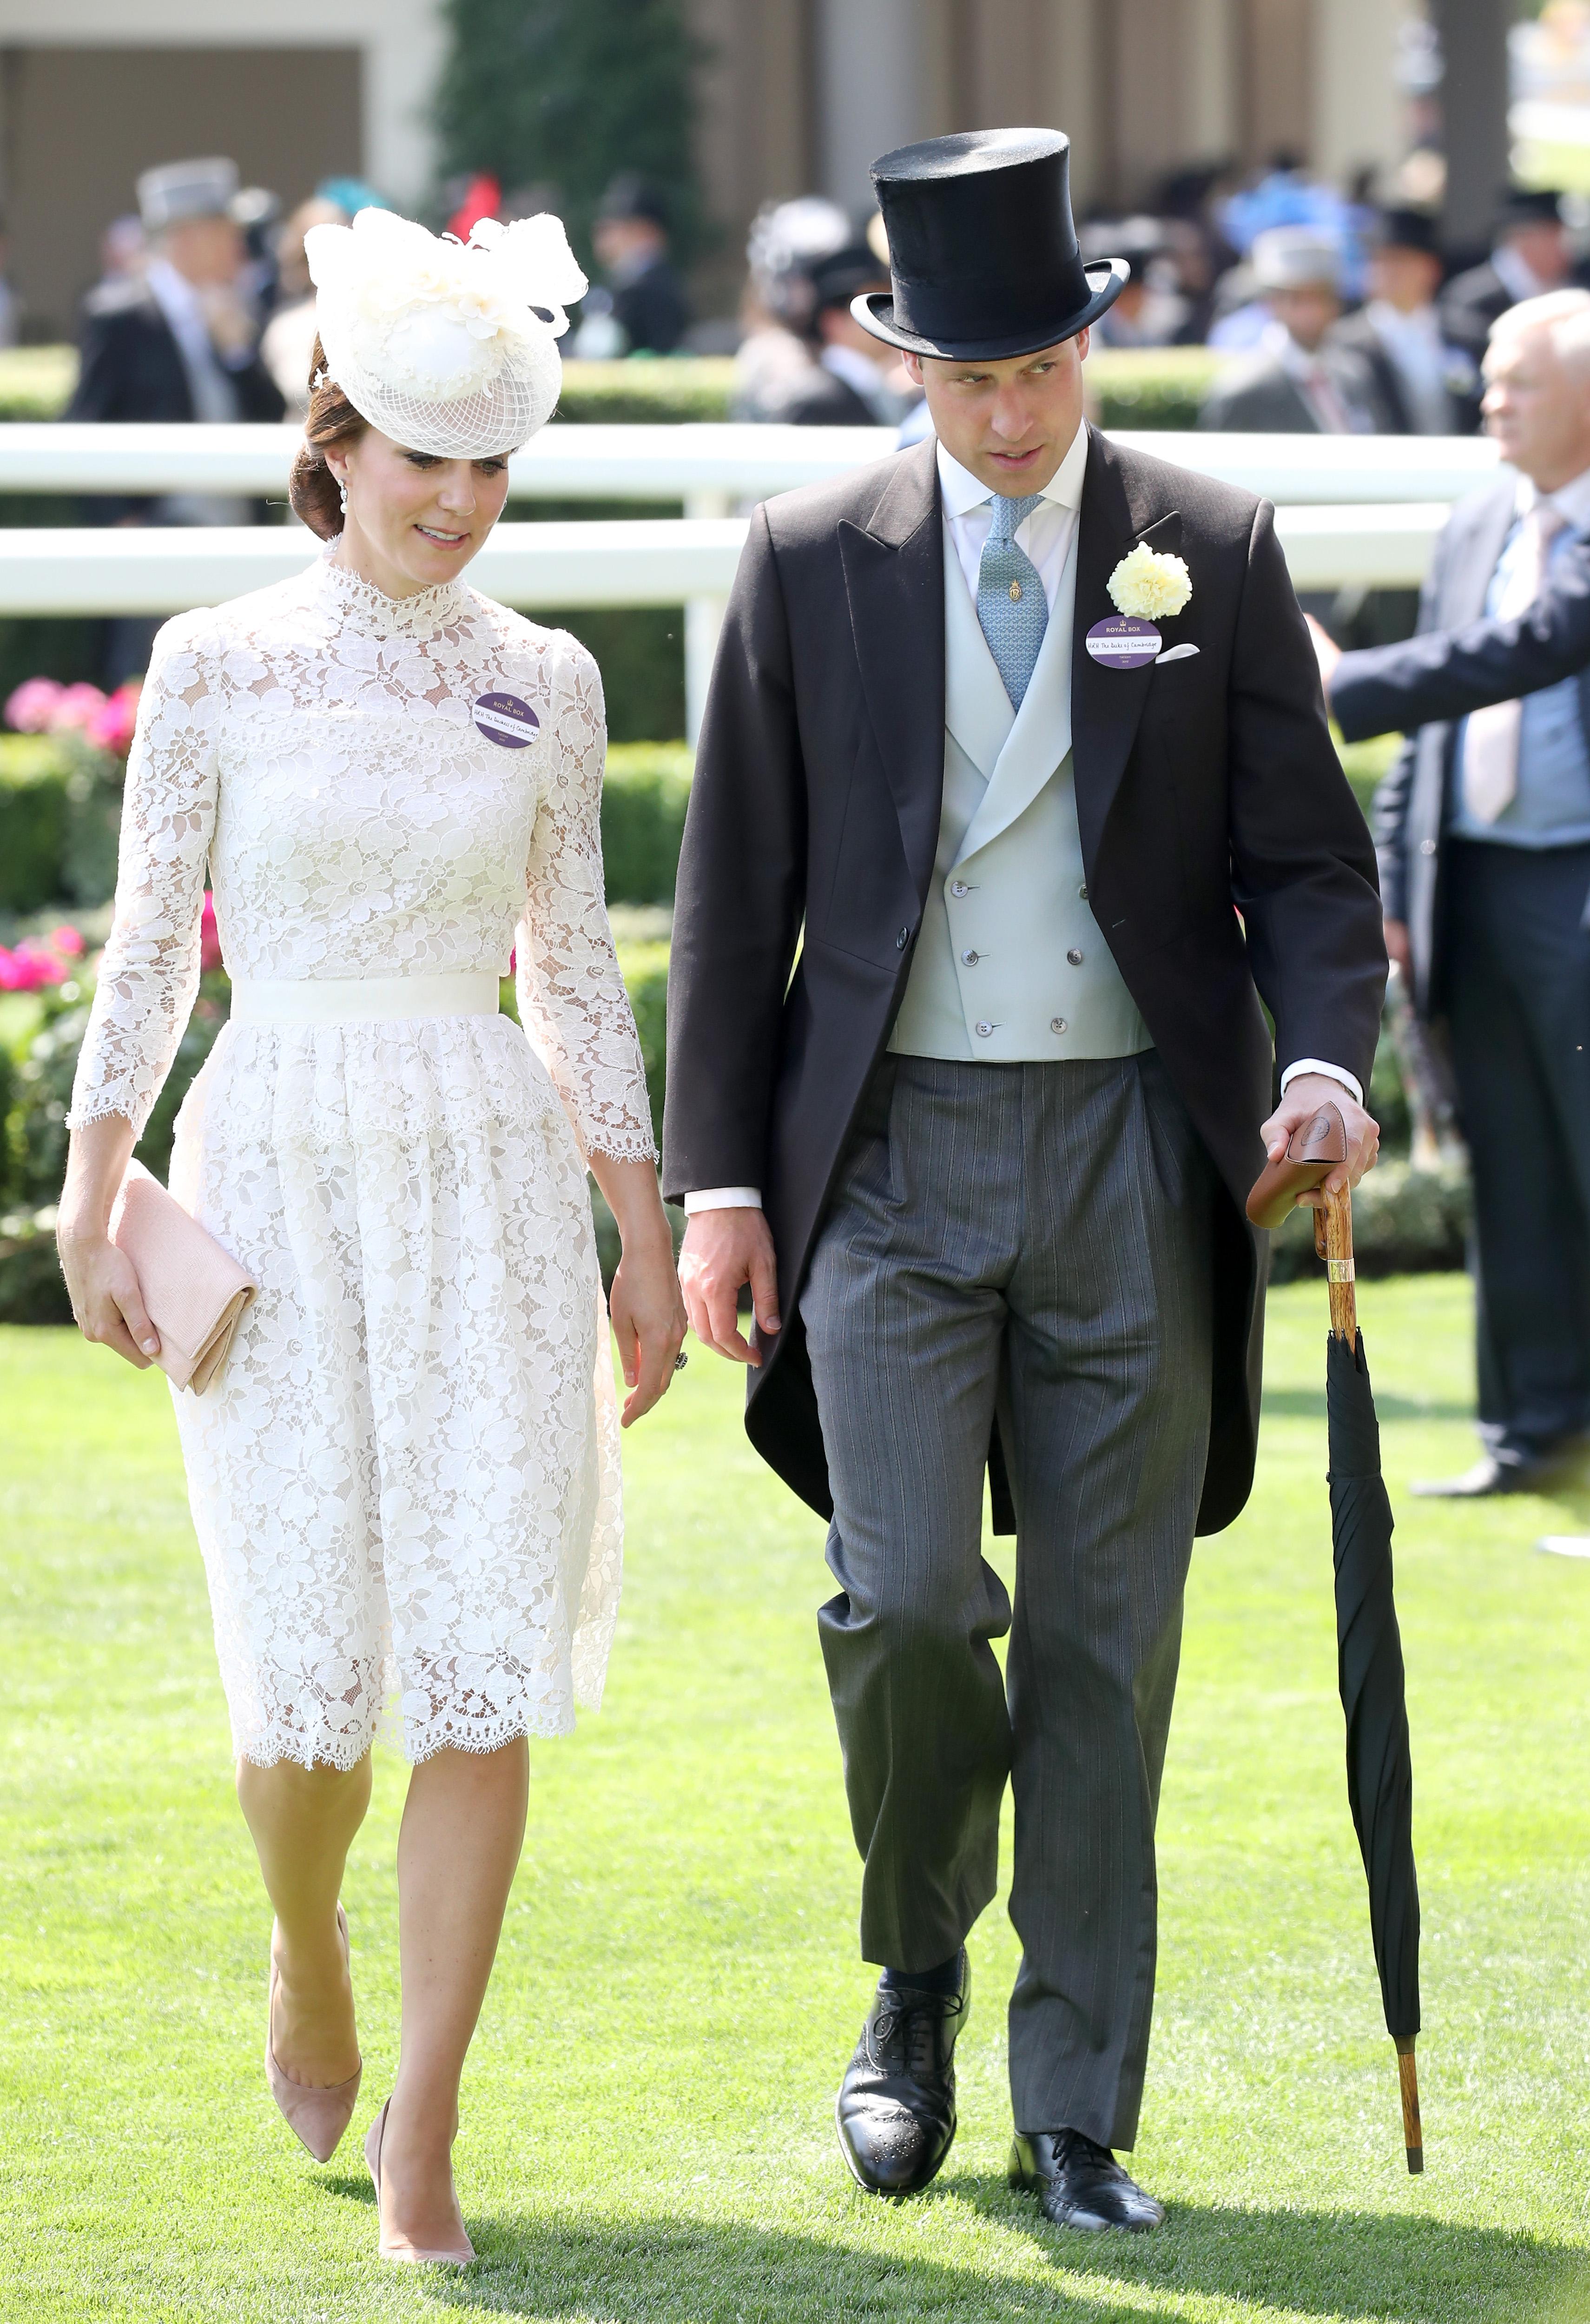 Duchess Kate and Prince William at Royal Ascot 2017